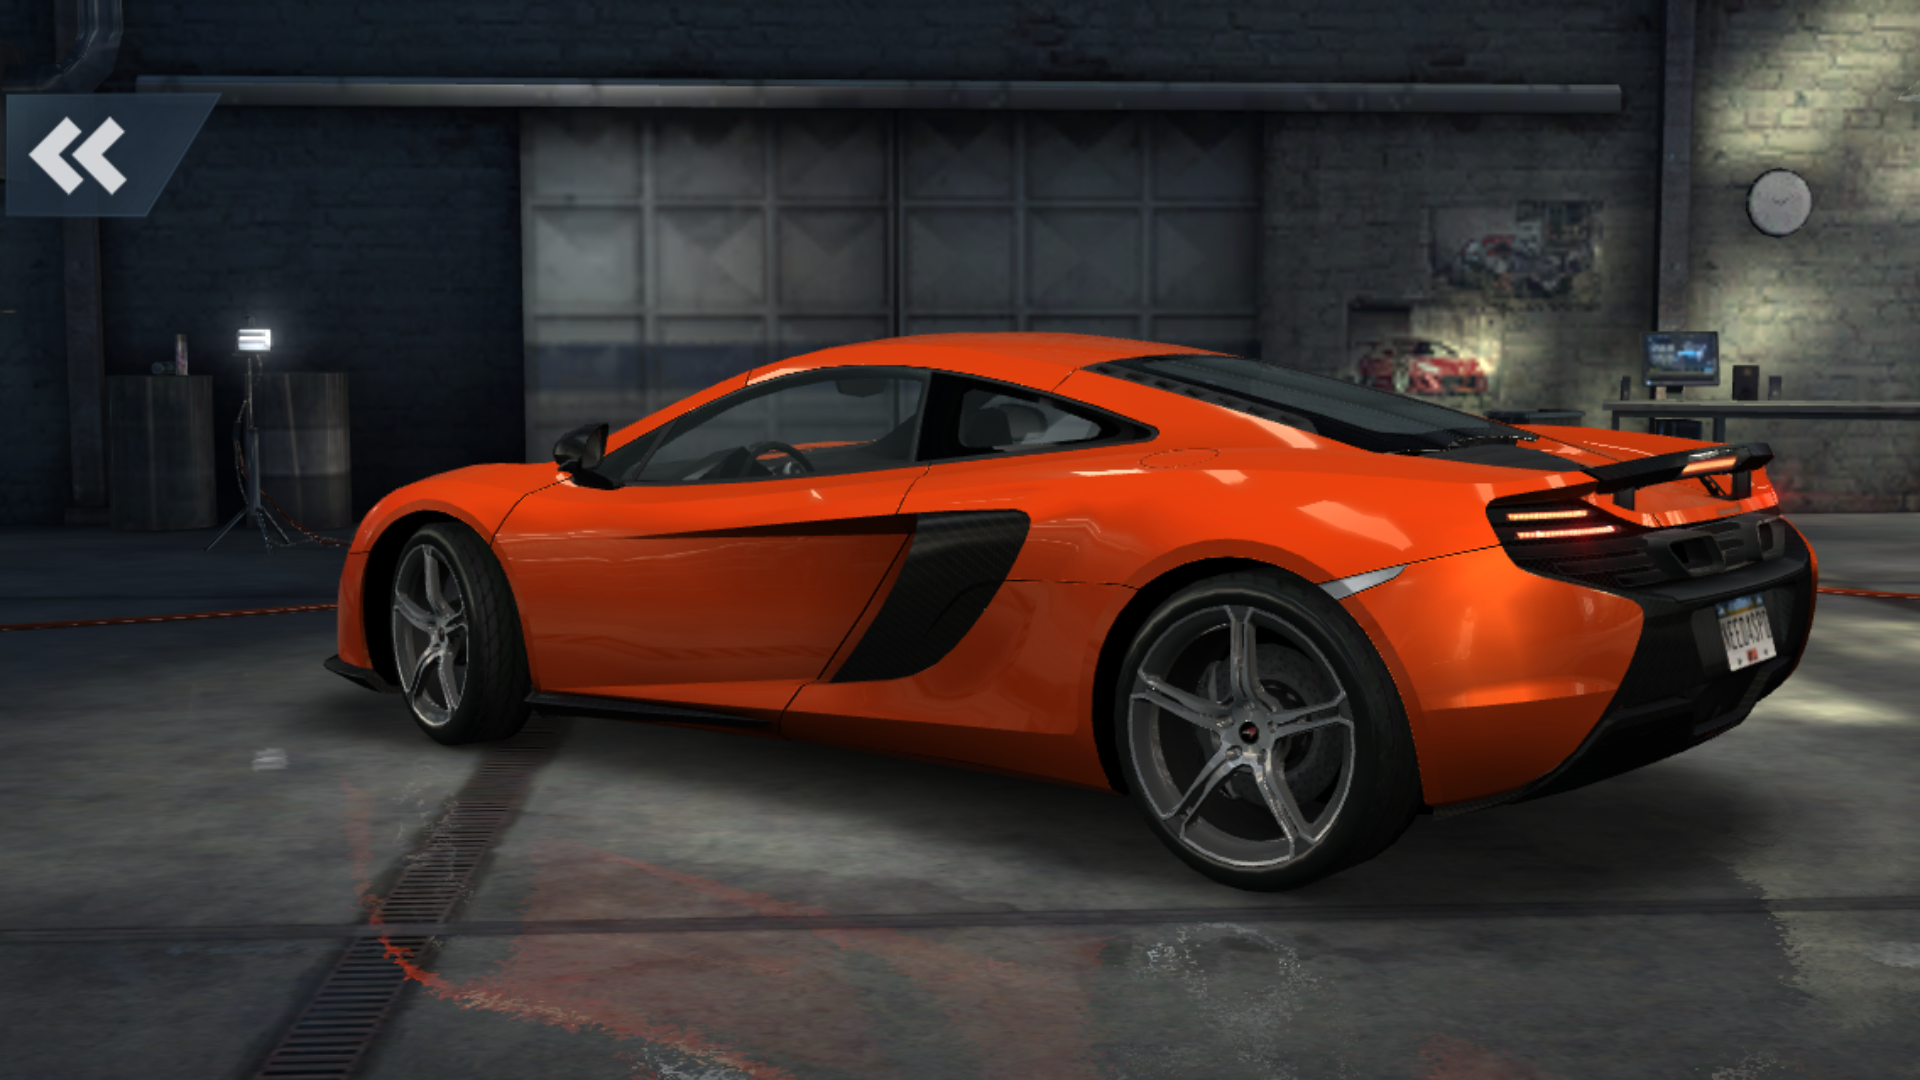 McLaren 650S | Need for Speed Wiki | FANDOM powered by Wikia